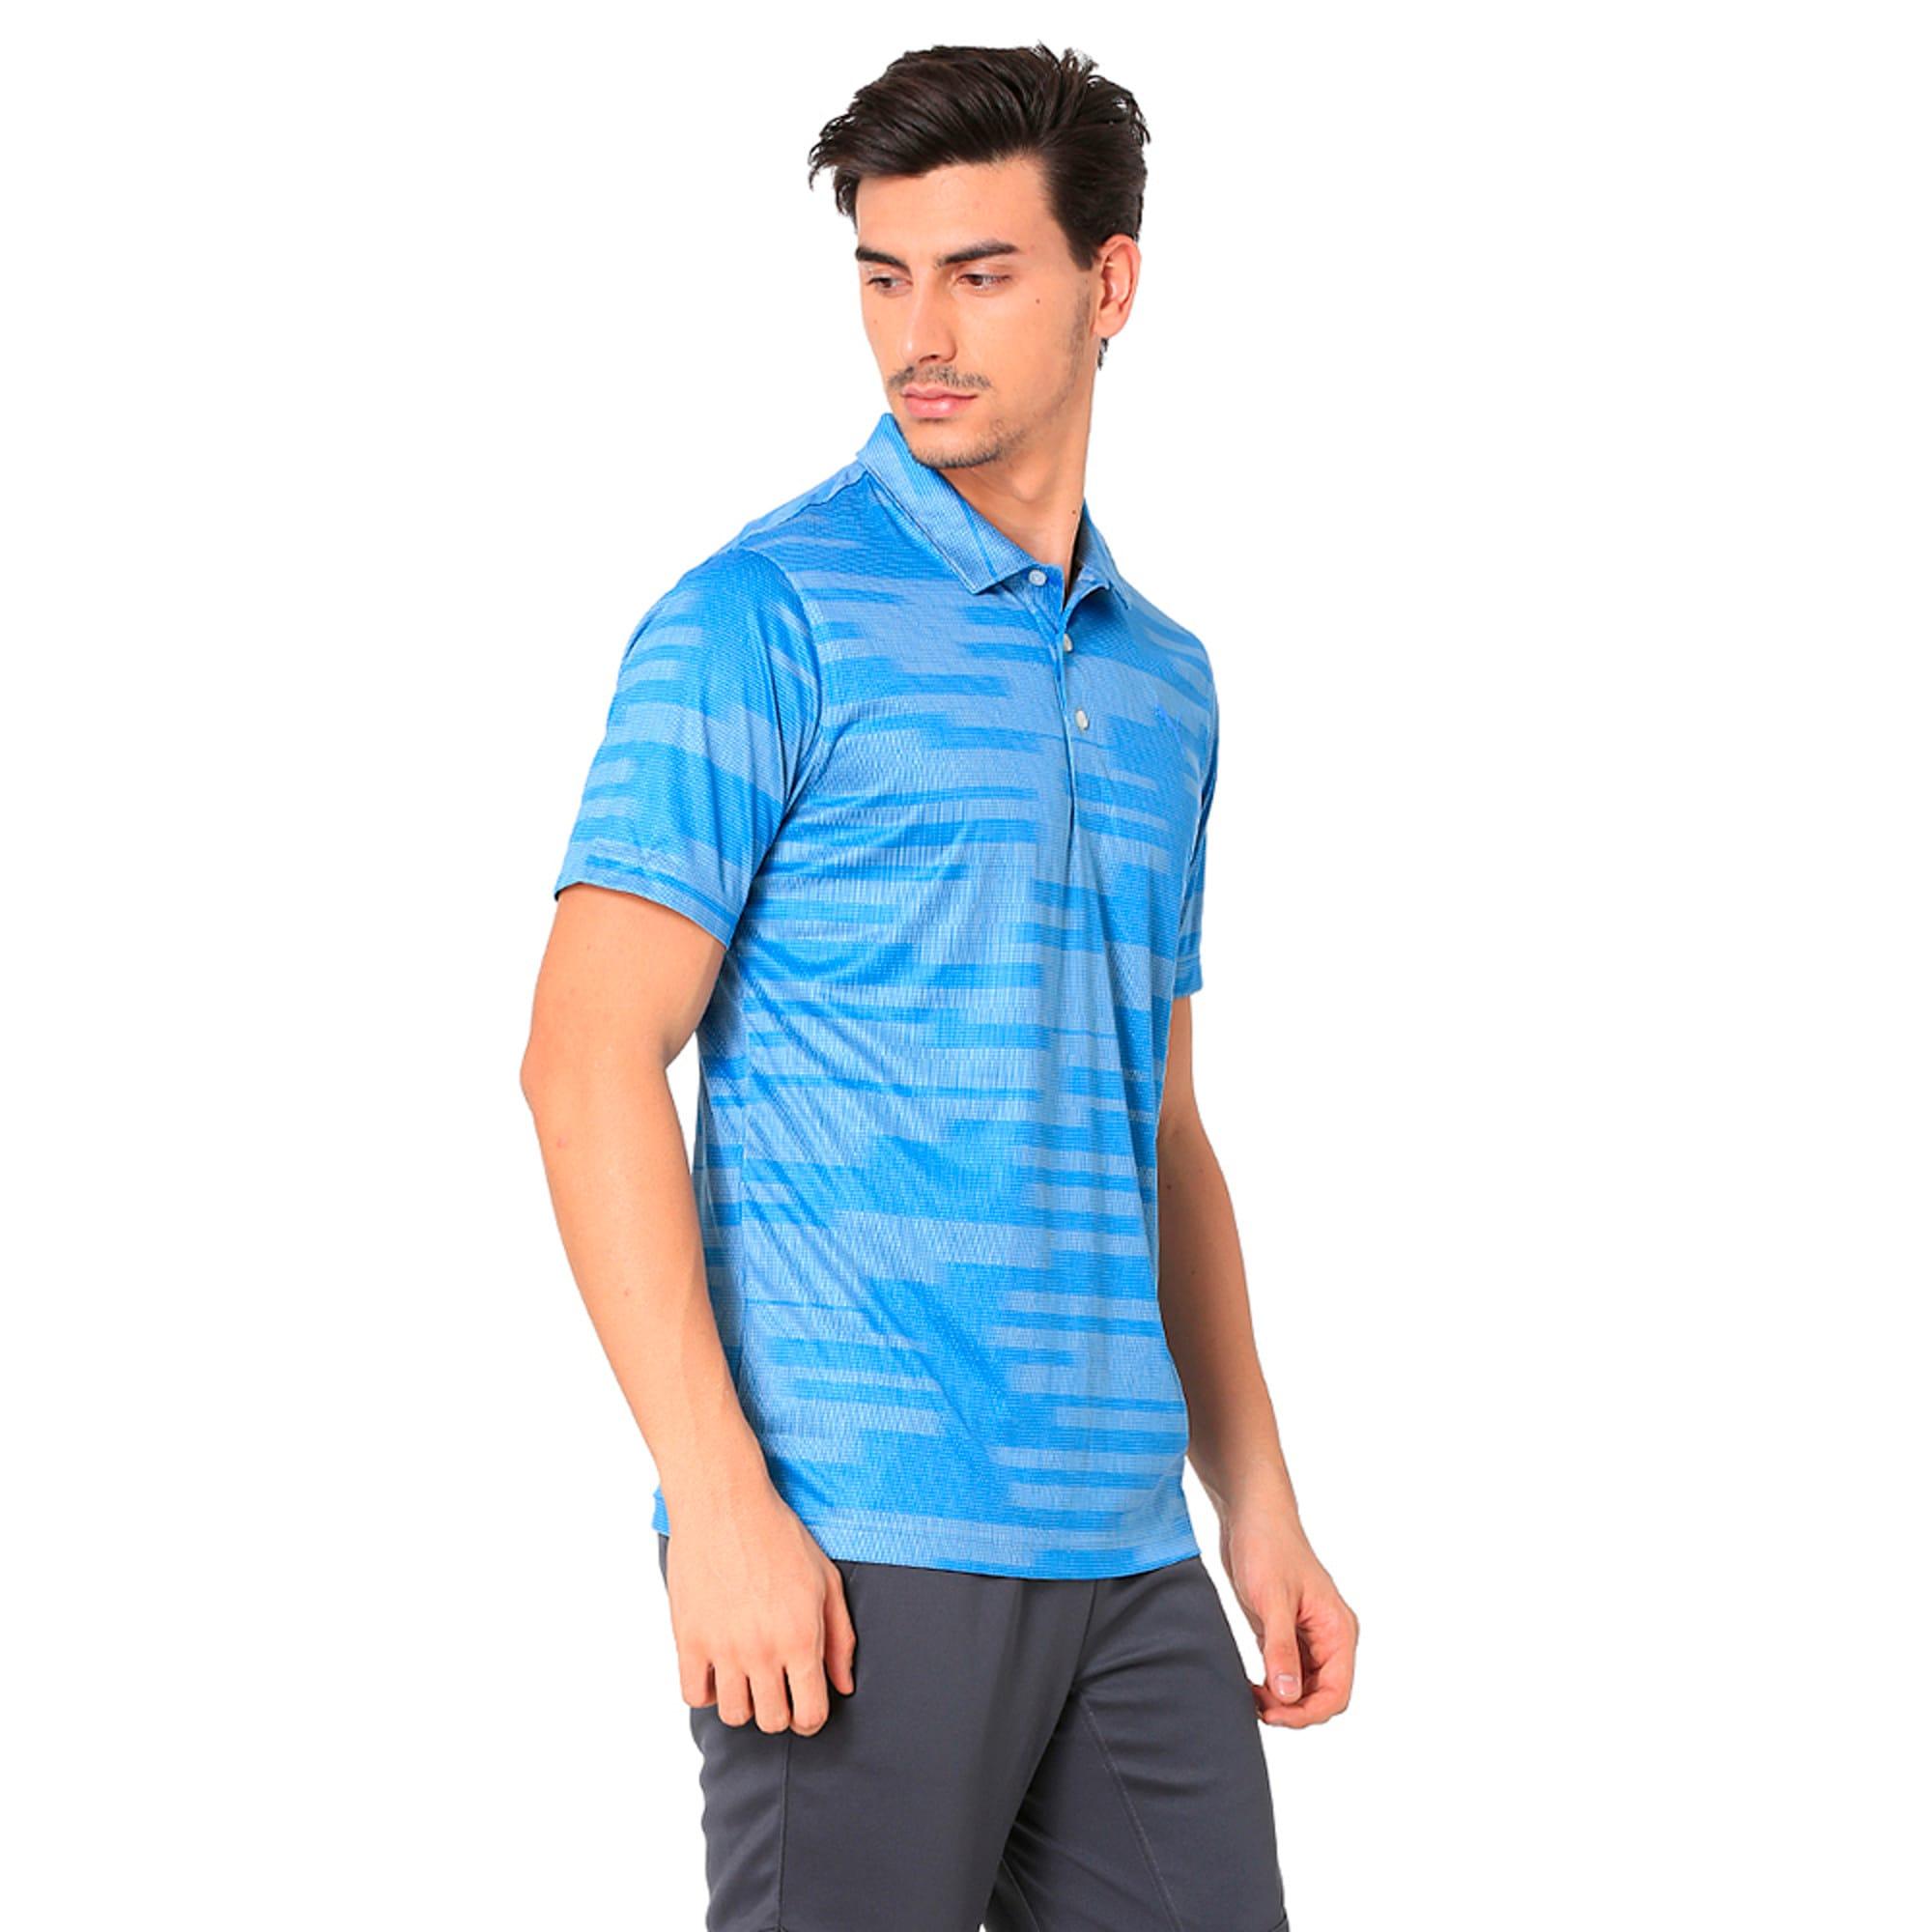 Thumbnail 5 of Golf Men's PWRCOOL Blur Polo, marina, medium-IND